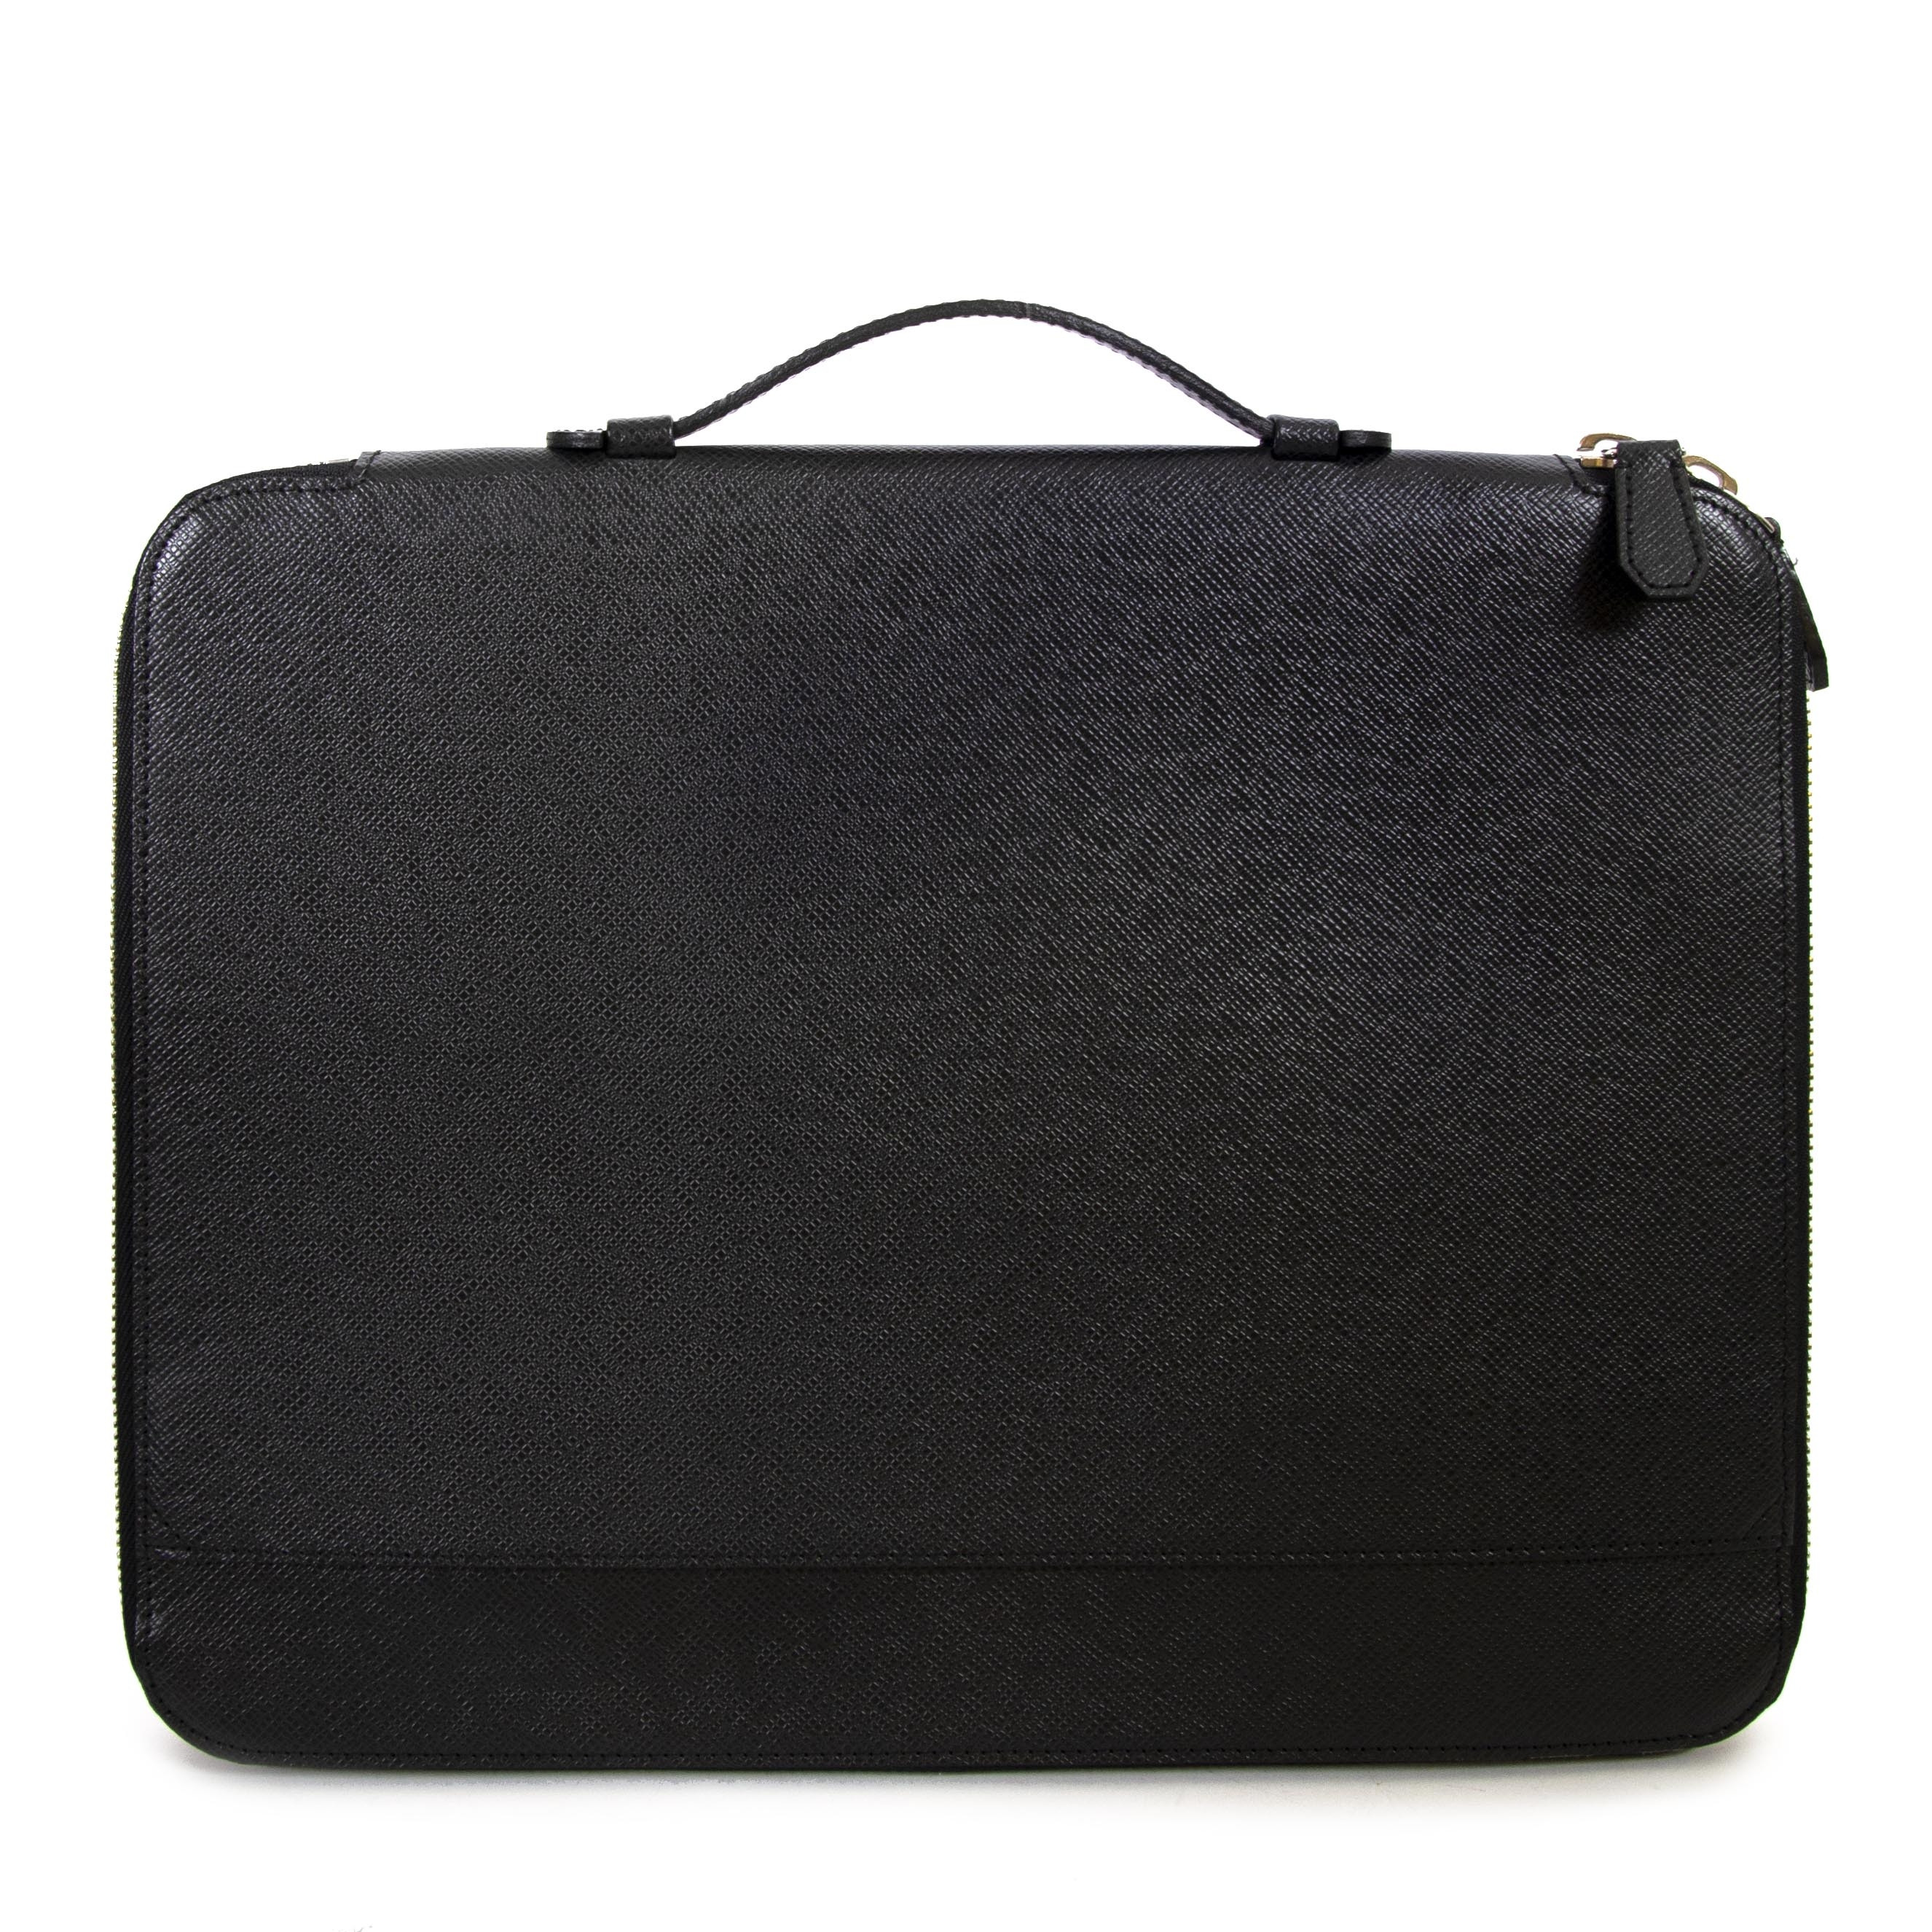 ... koop Louis Vuitton Black Vladimir Aroise Briefcase en betaal veilig  online 48f927341e9